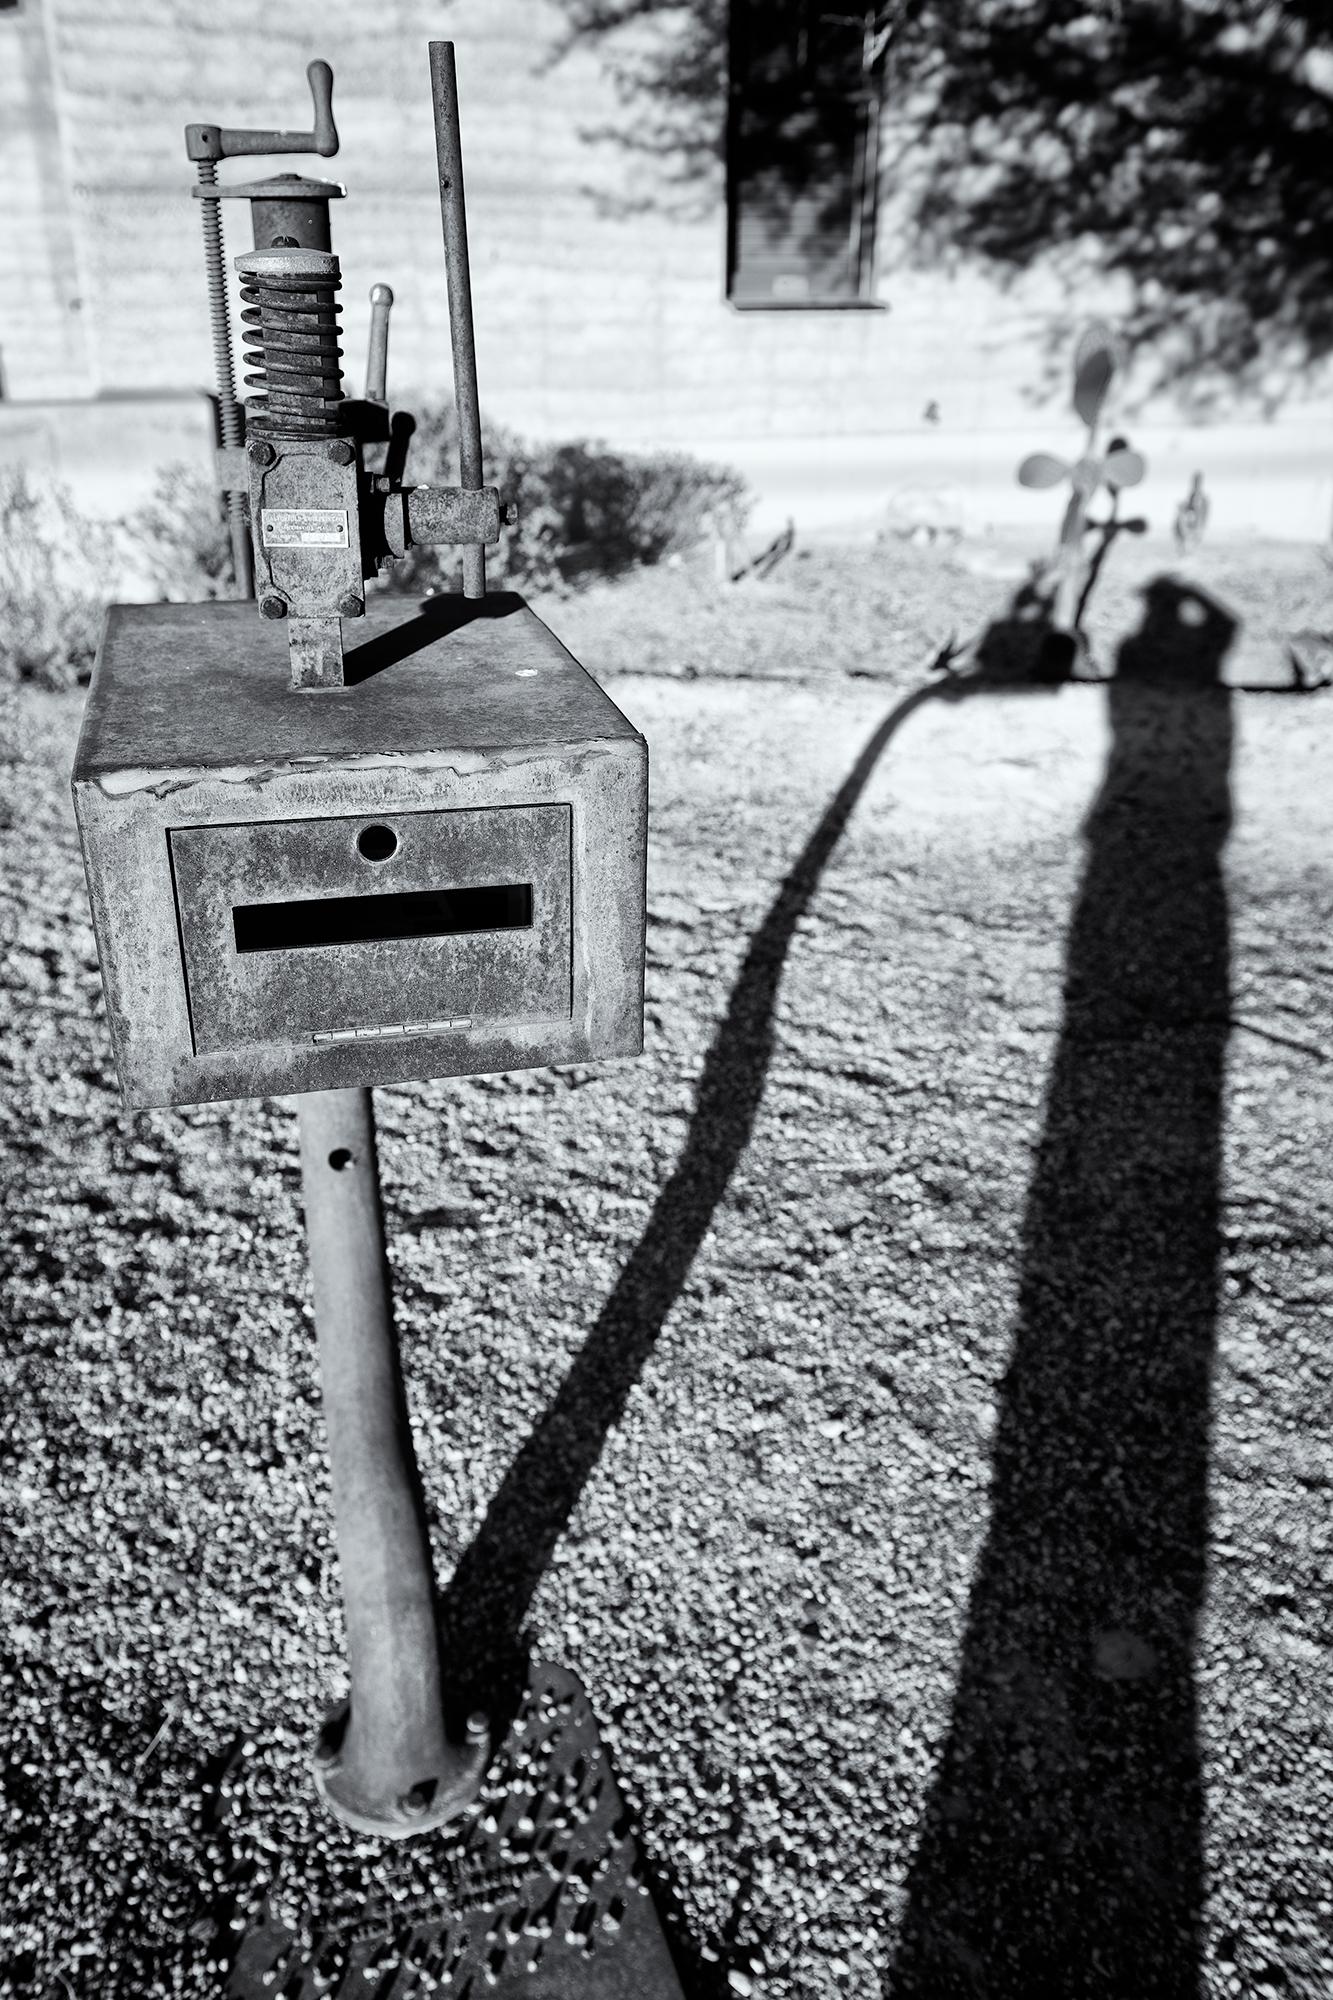 Maibox Photographer. Tucson, Arizona, 2015